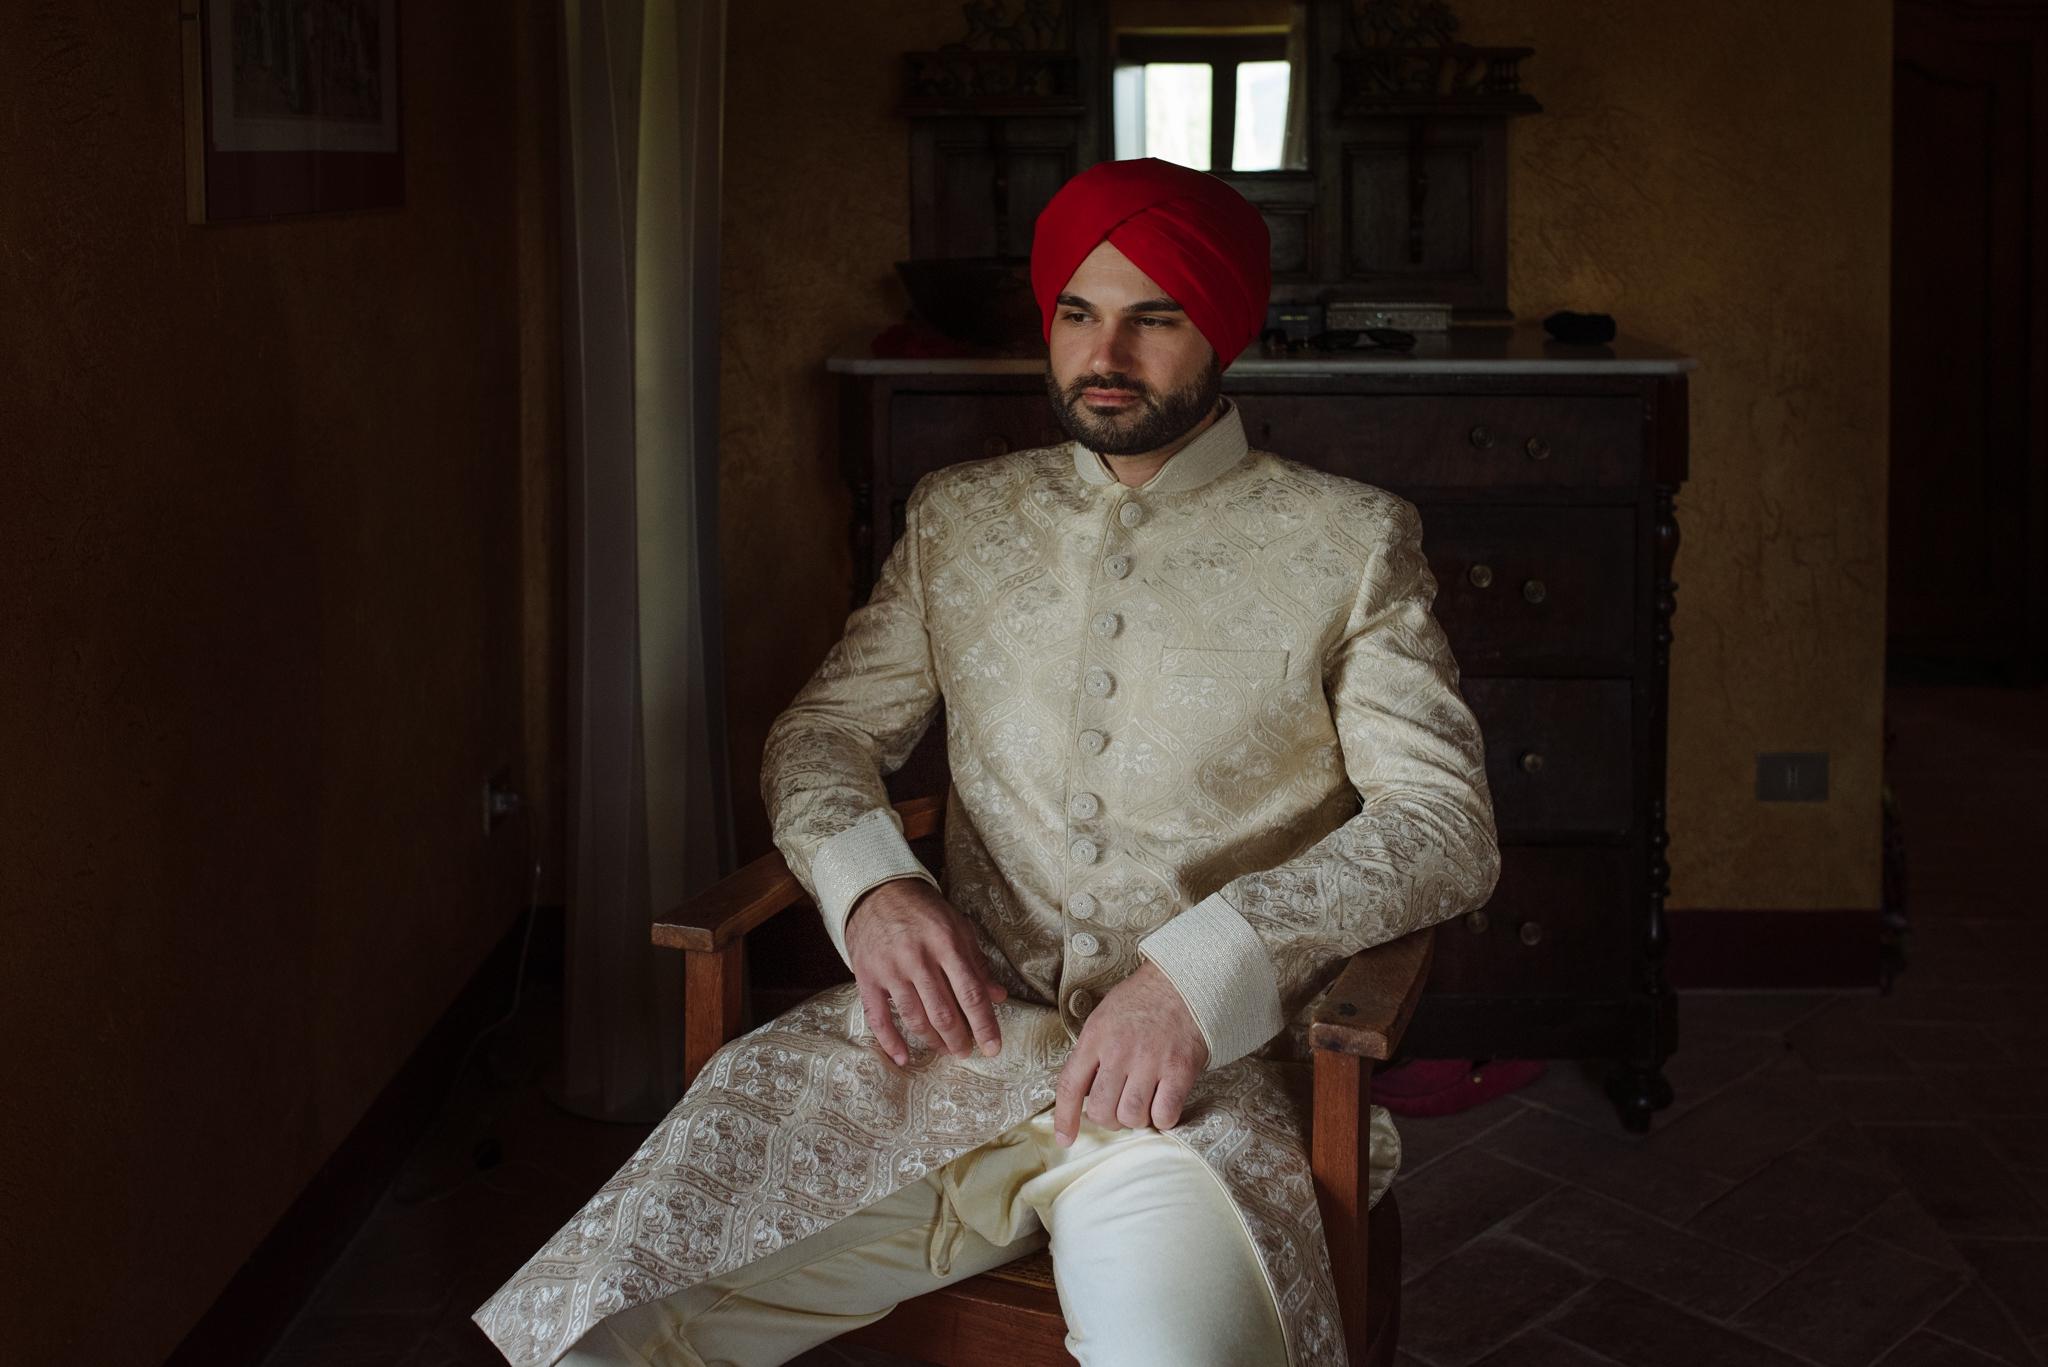 elisabetta-marzetti-indian-wedding-italy_0016.jpg